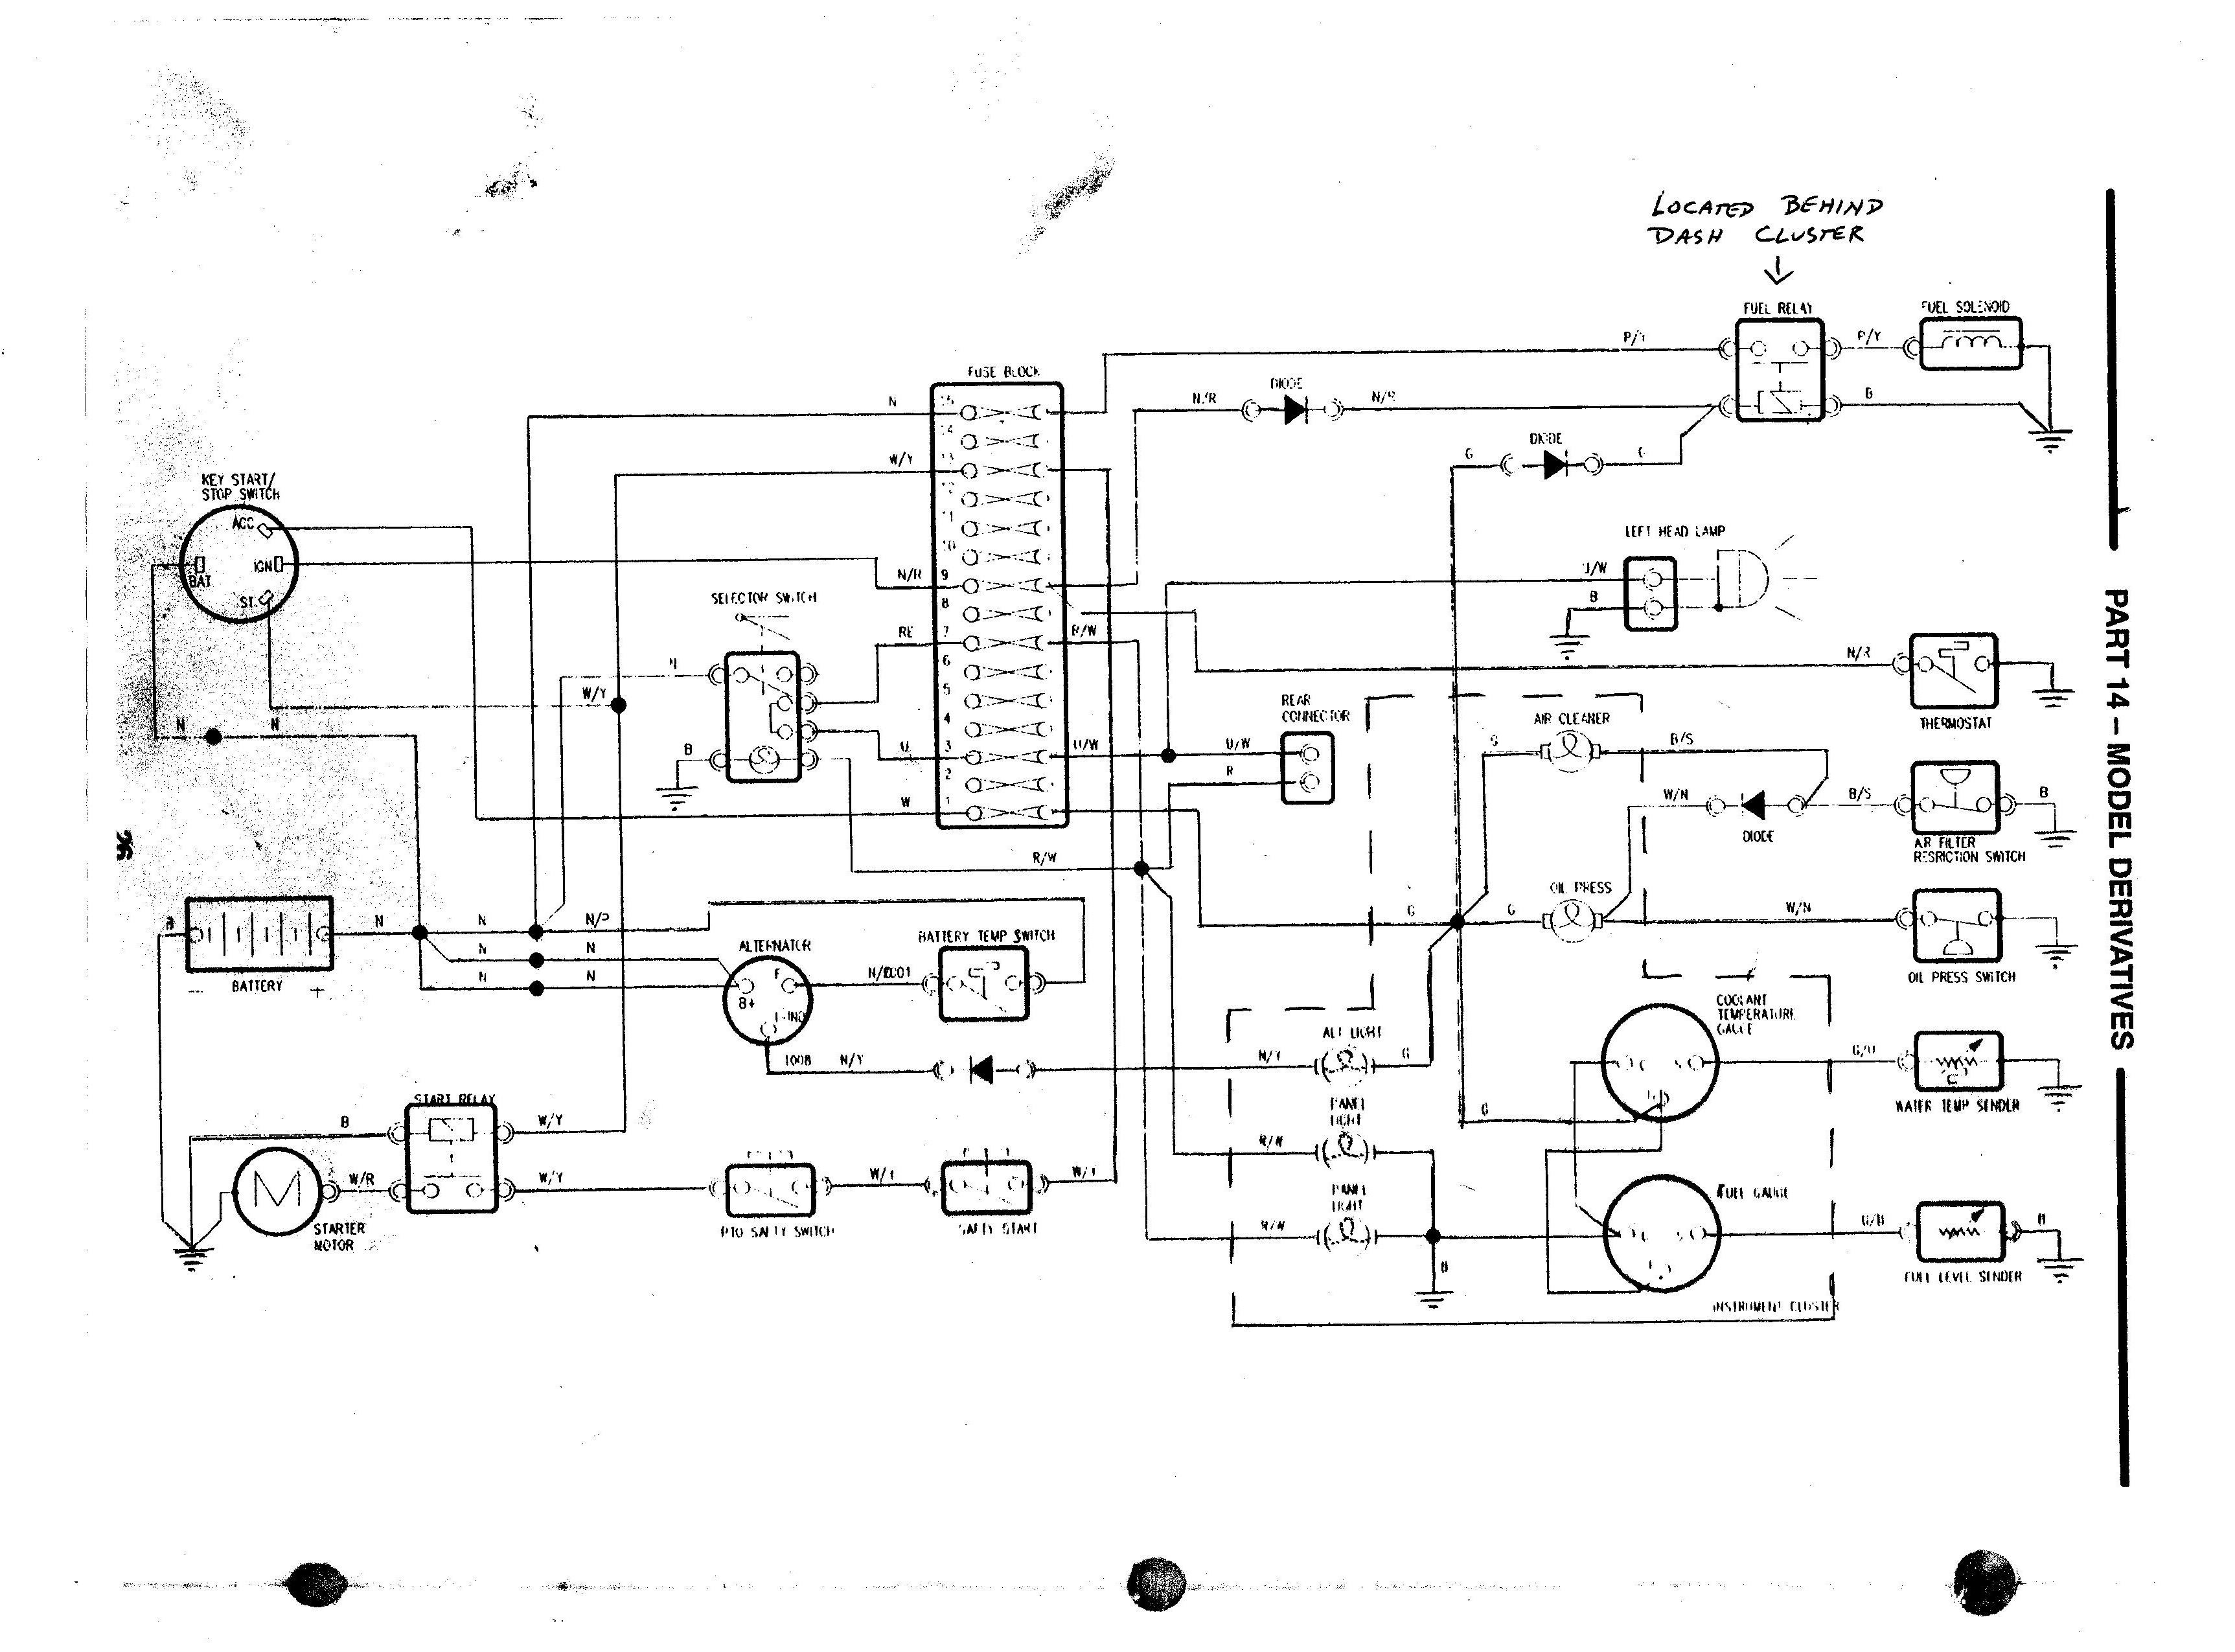 30 New Holland Ls180 Wiring Diagram